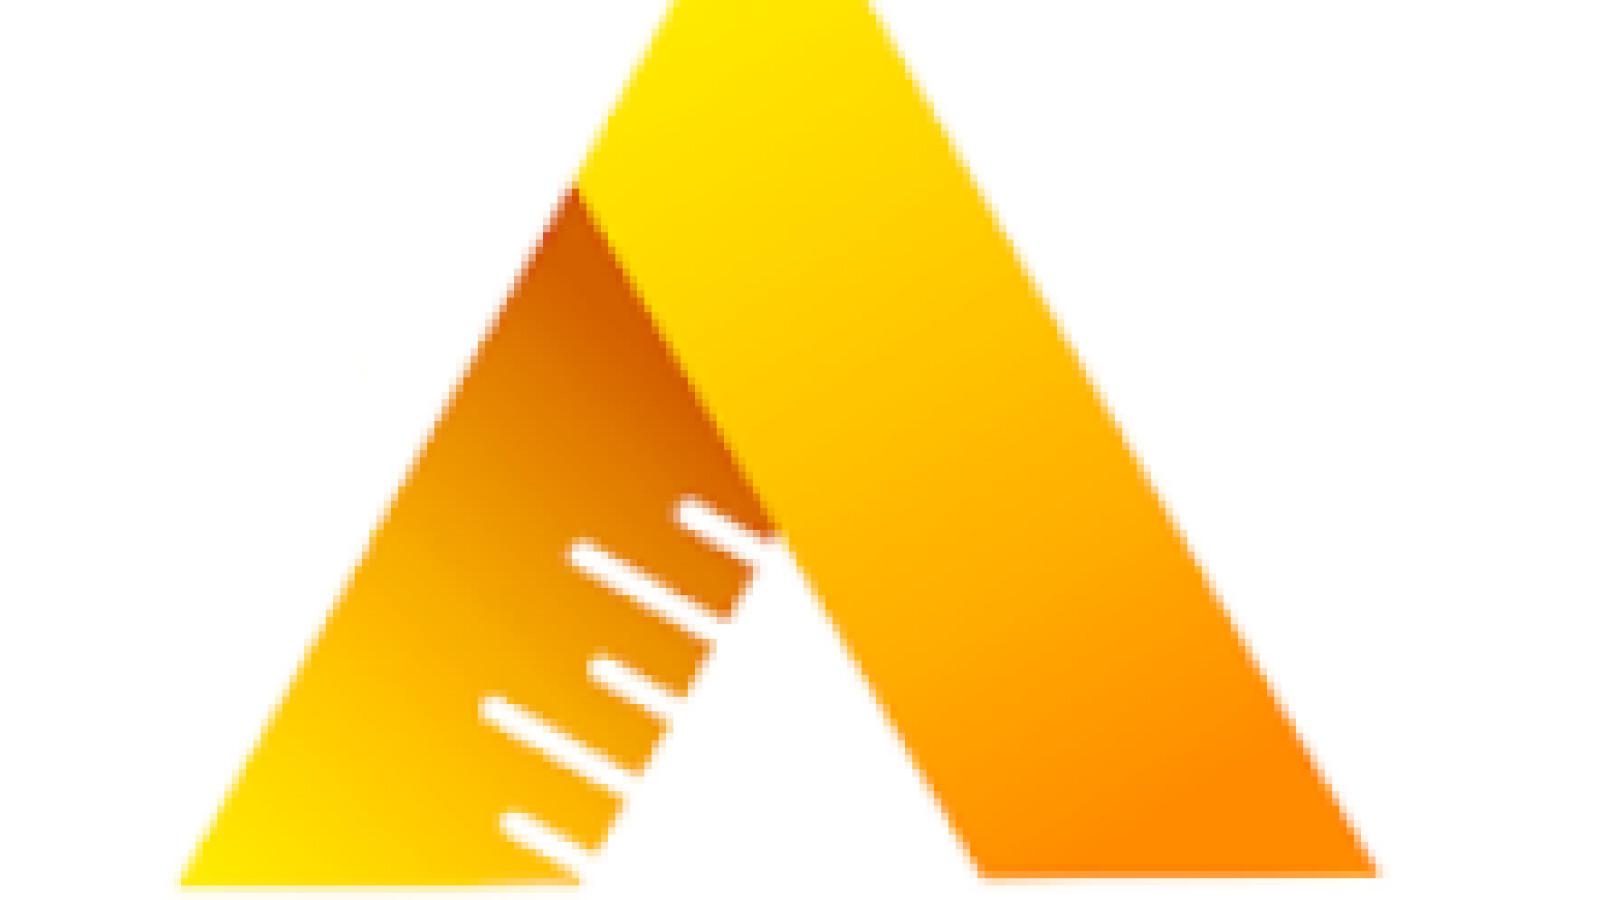 AR Ruler - Download